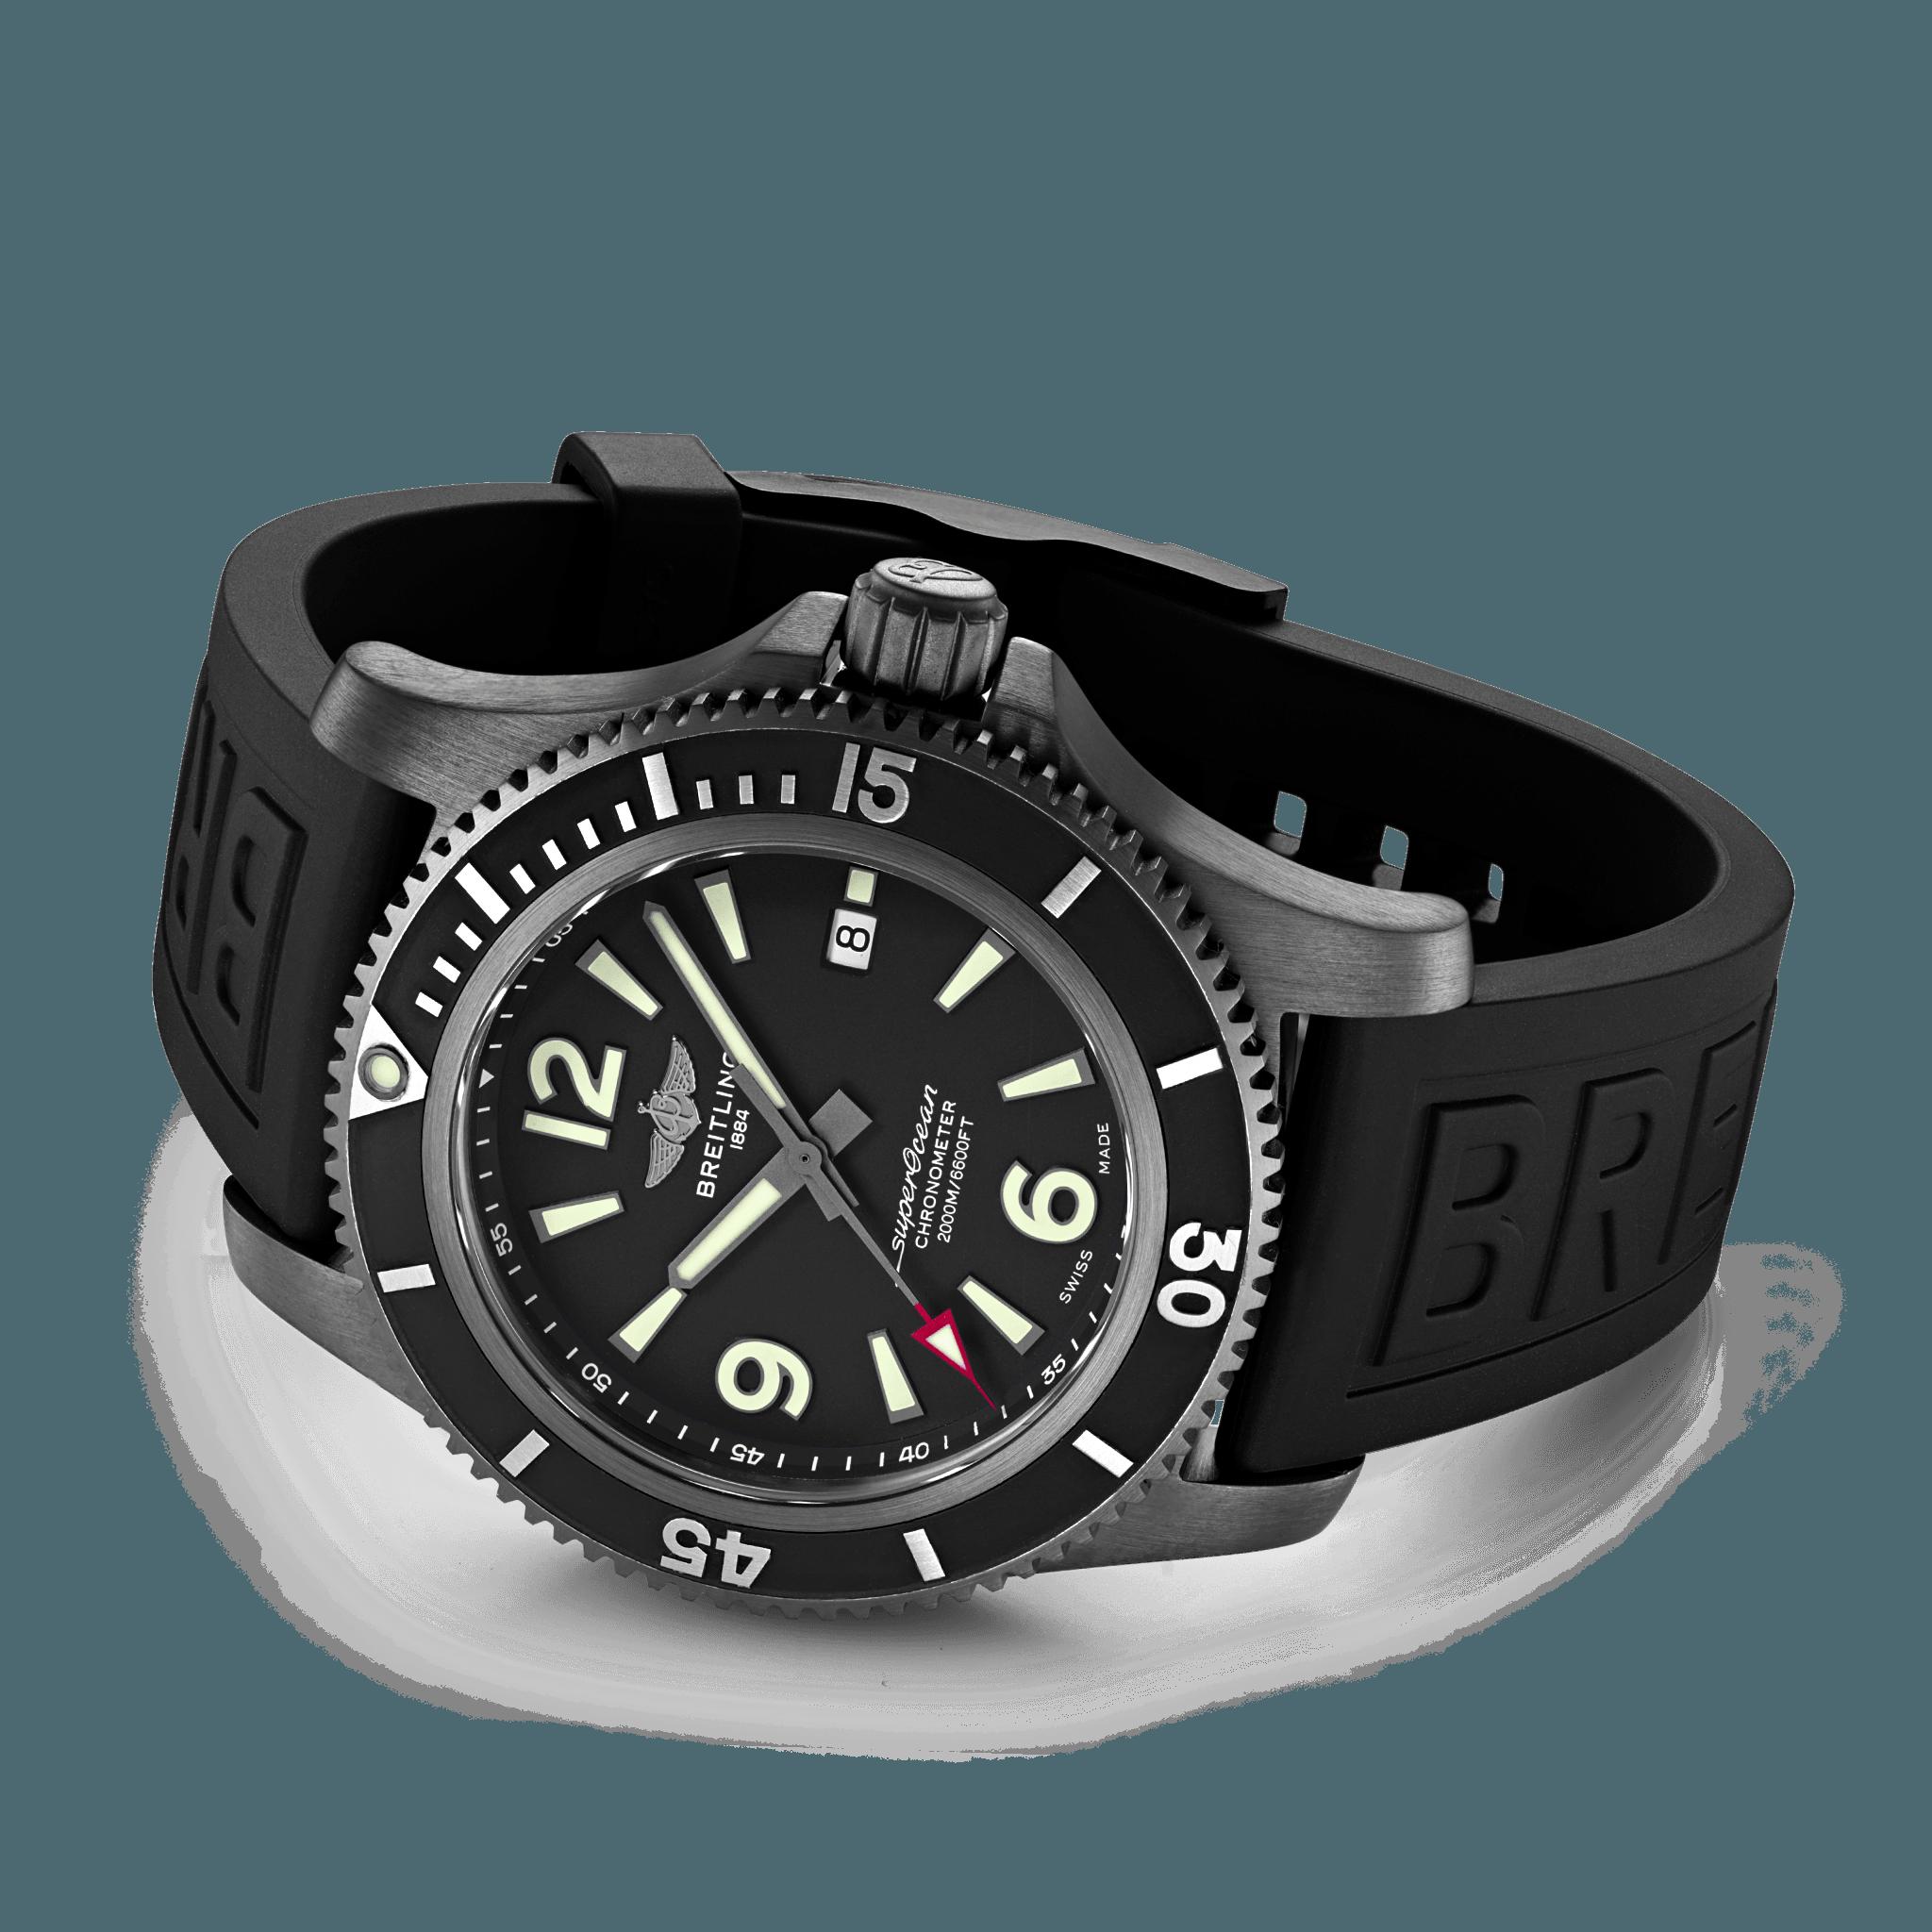 Breitling Superocean Automatic 46mm Black Steel Ref. m17368b71b1s1